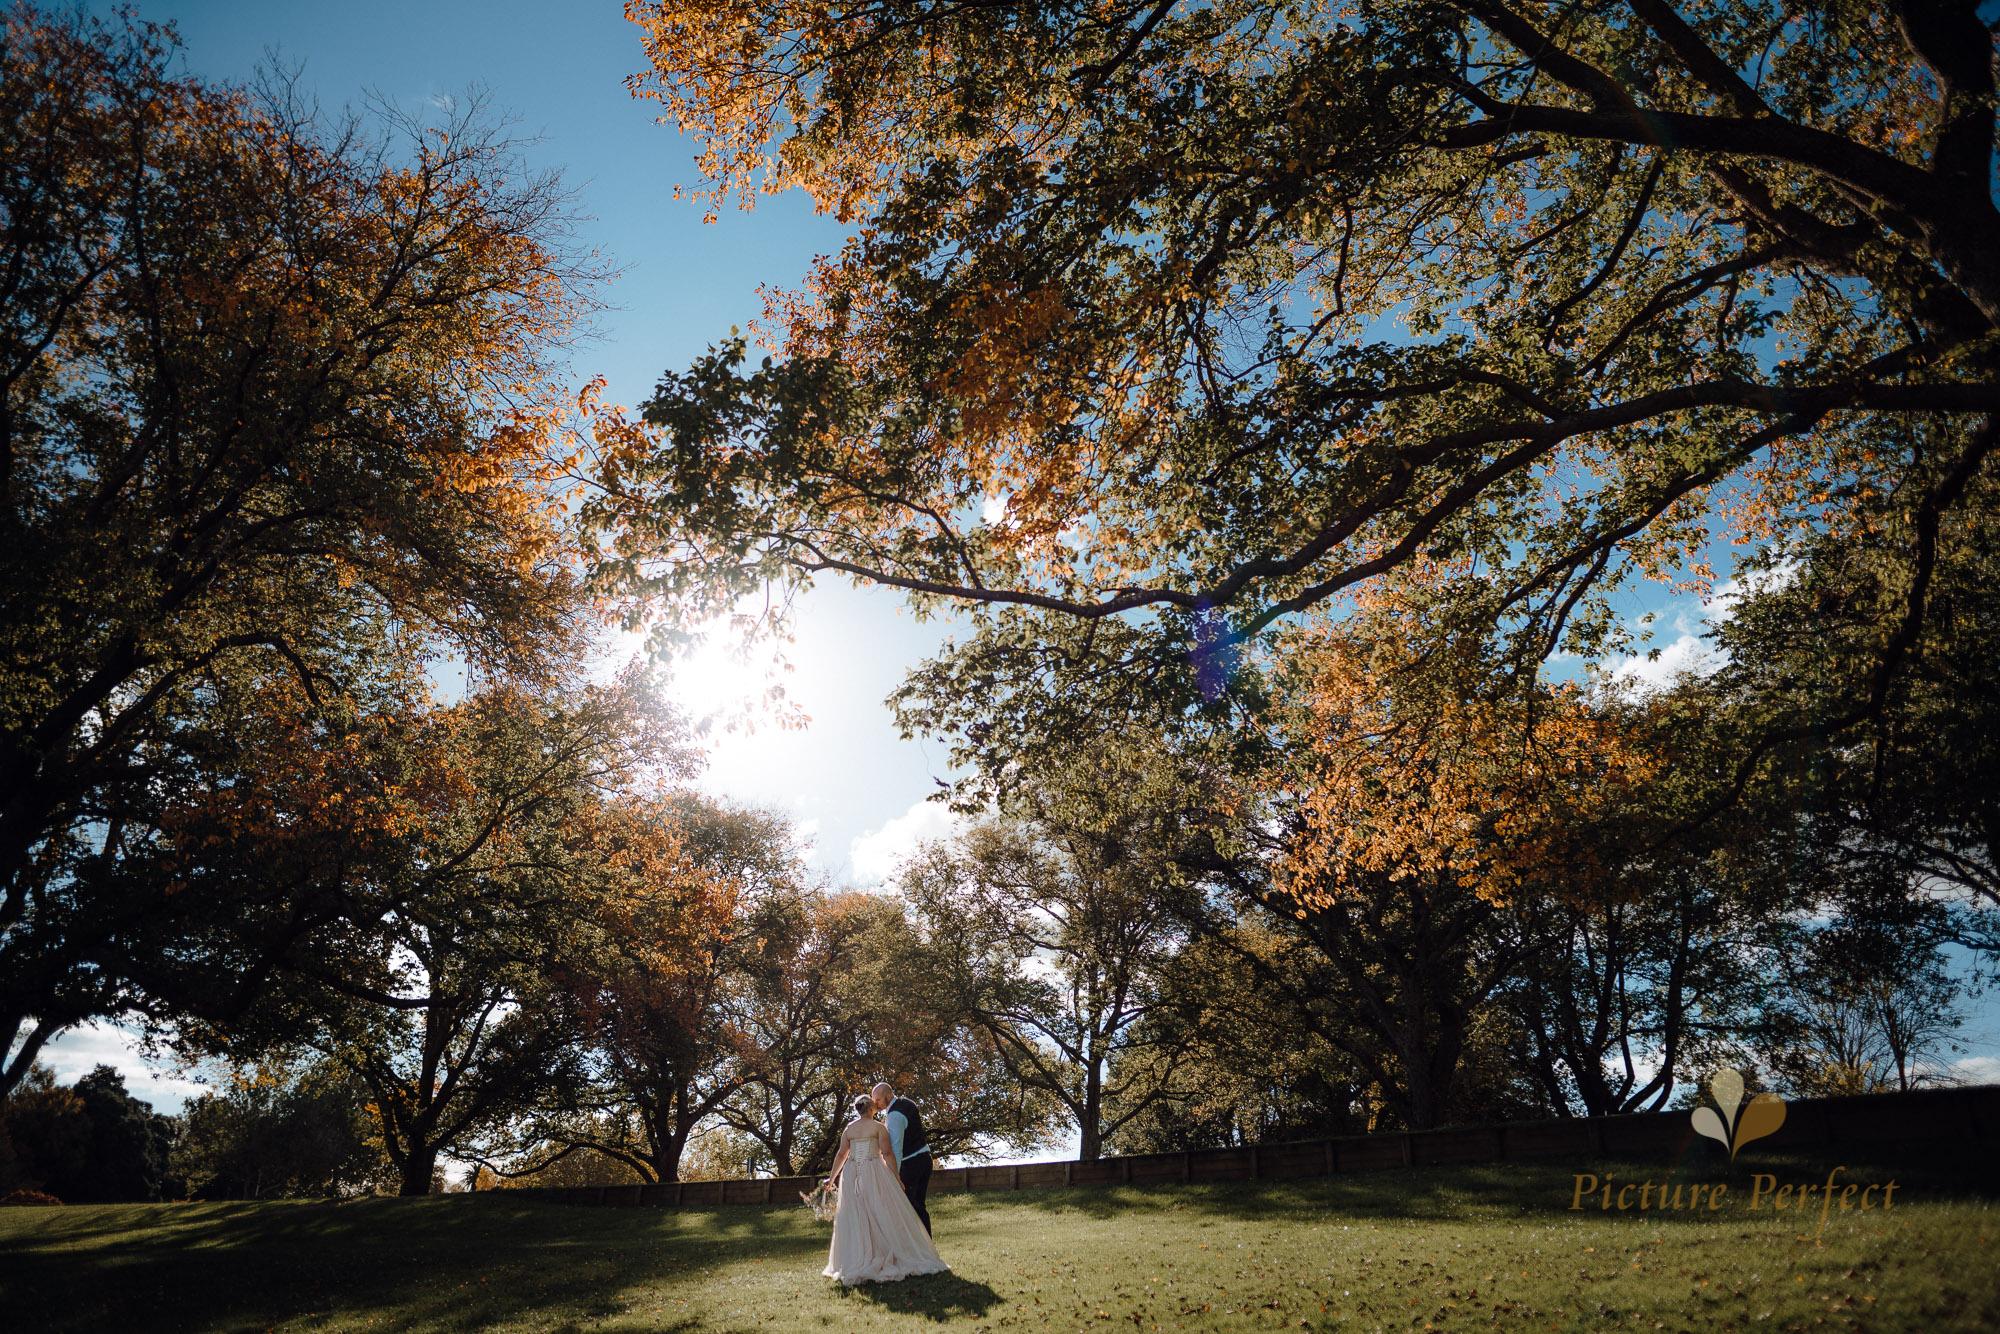 Manawatu beach bridal photography during golden hour with Tina 0025